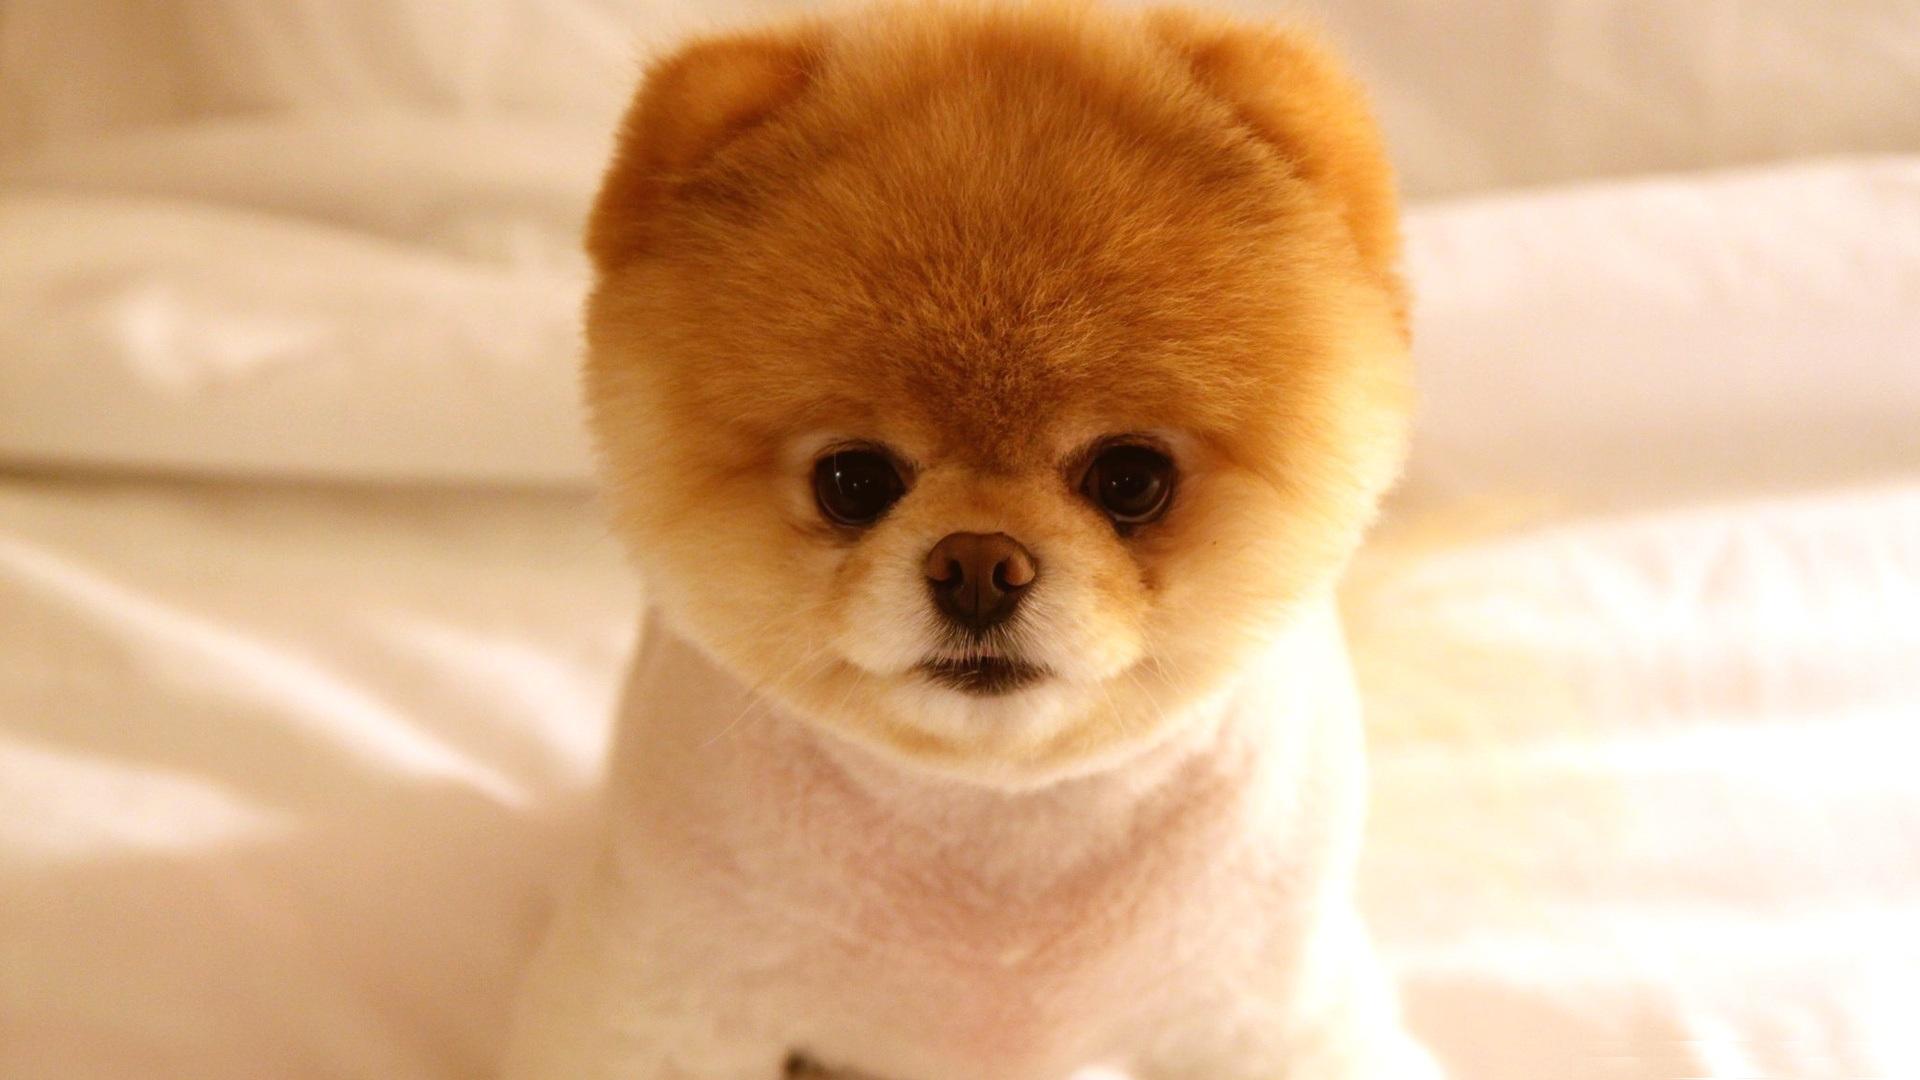 Cute Puppies #17